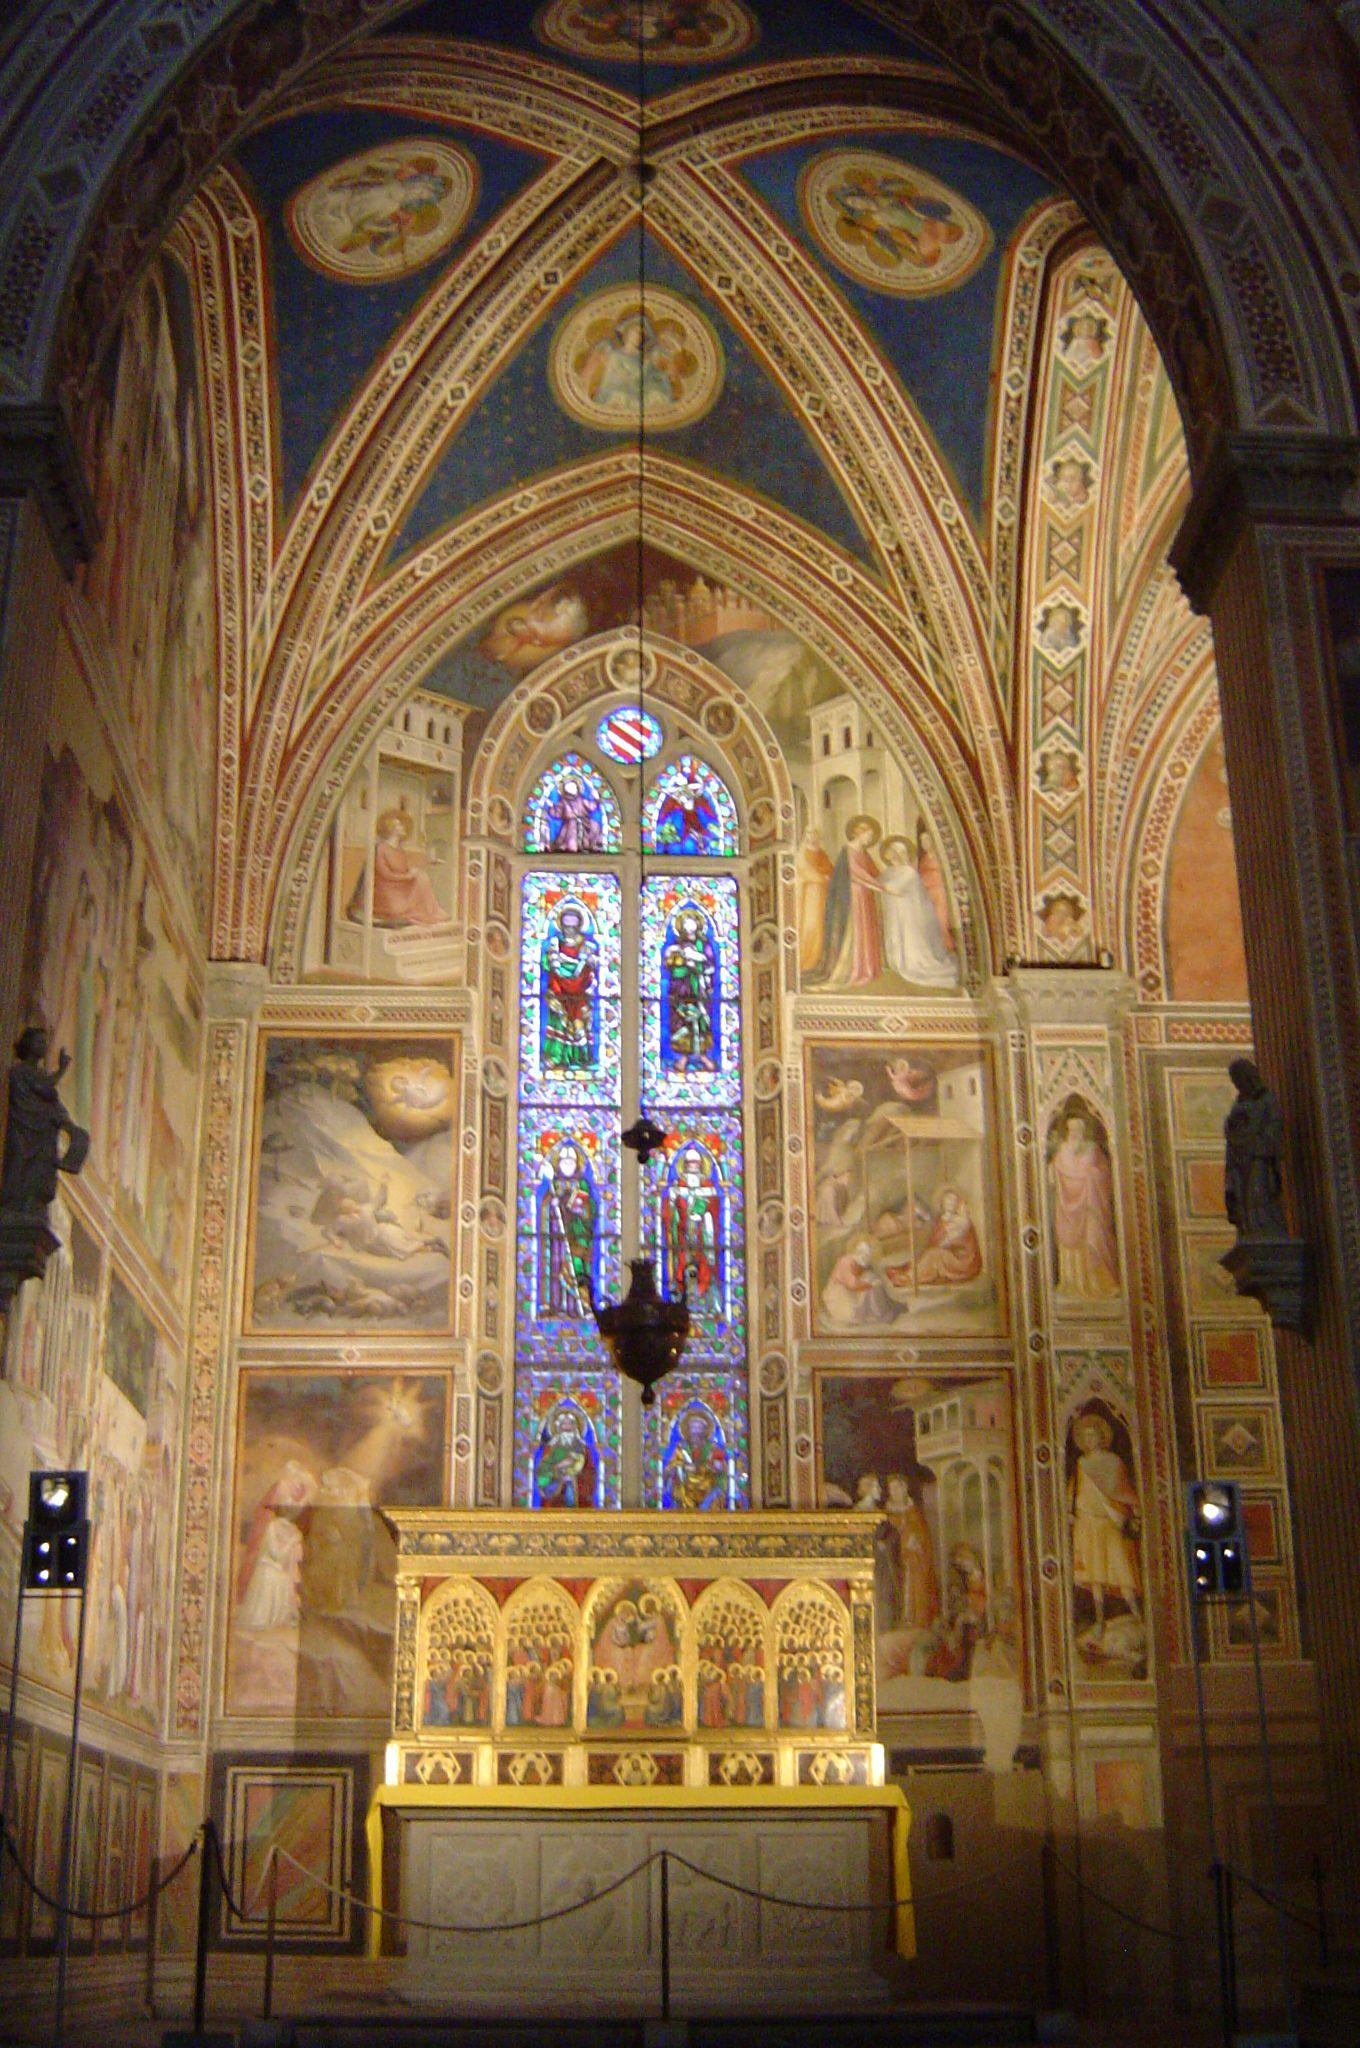 Dentro de Santa Croce